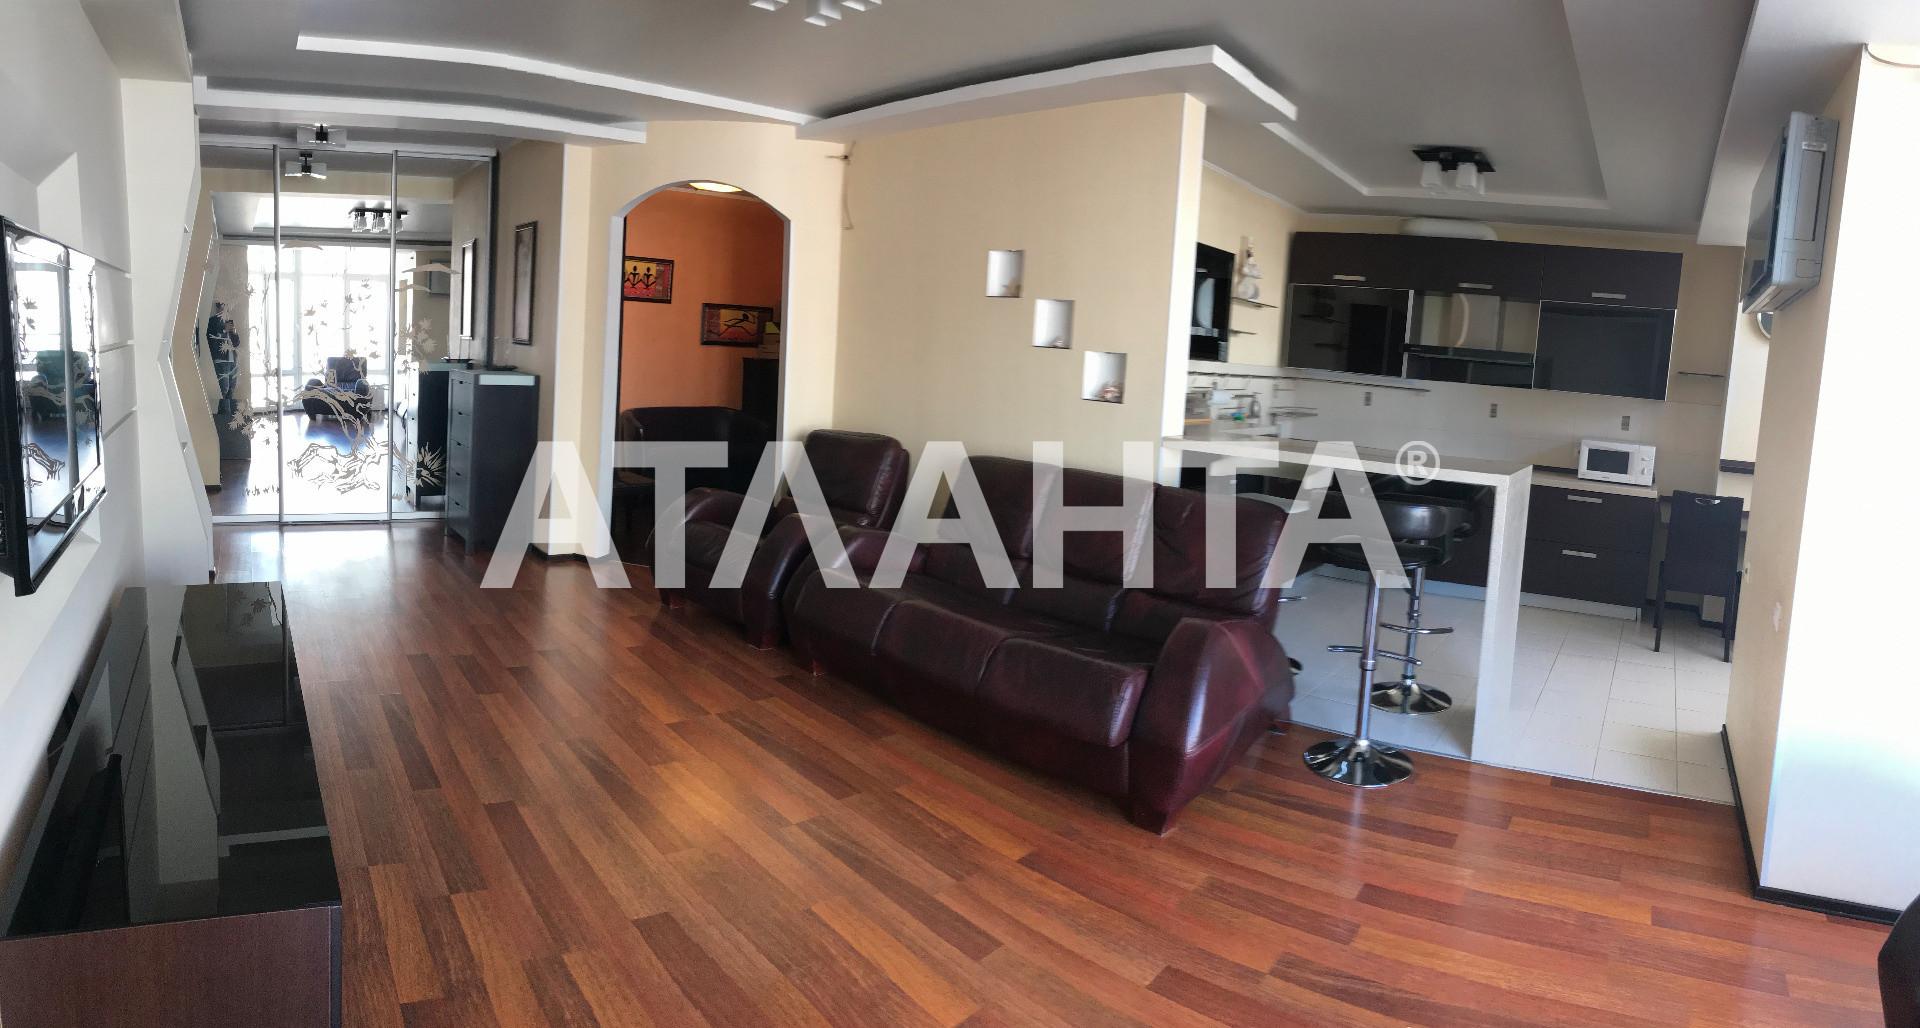 Продается 3-комнатная Квартира на ул. Ул. Ломоносова — 135 000 у.е. (фото №6)